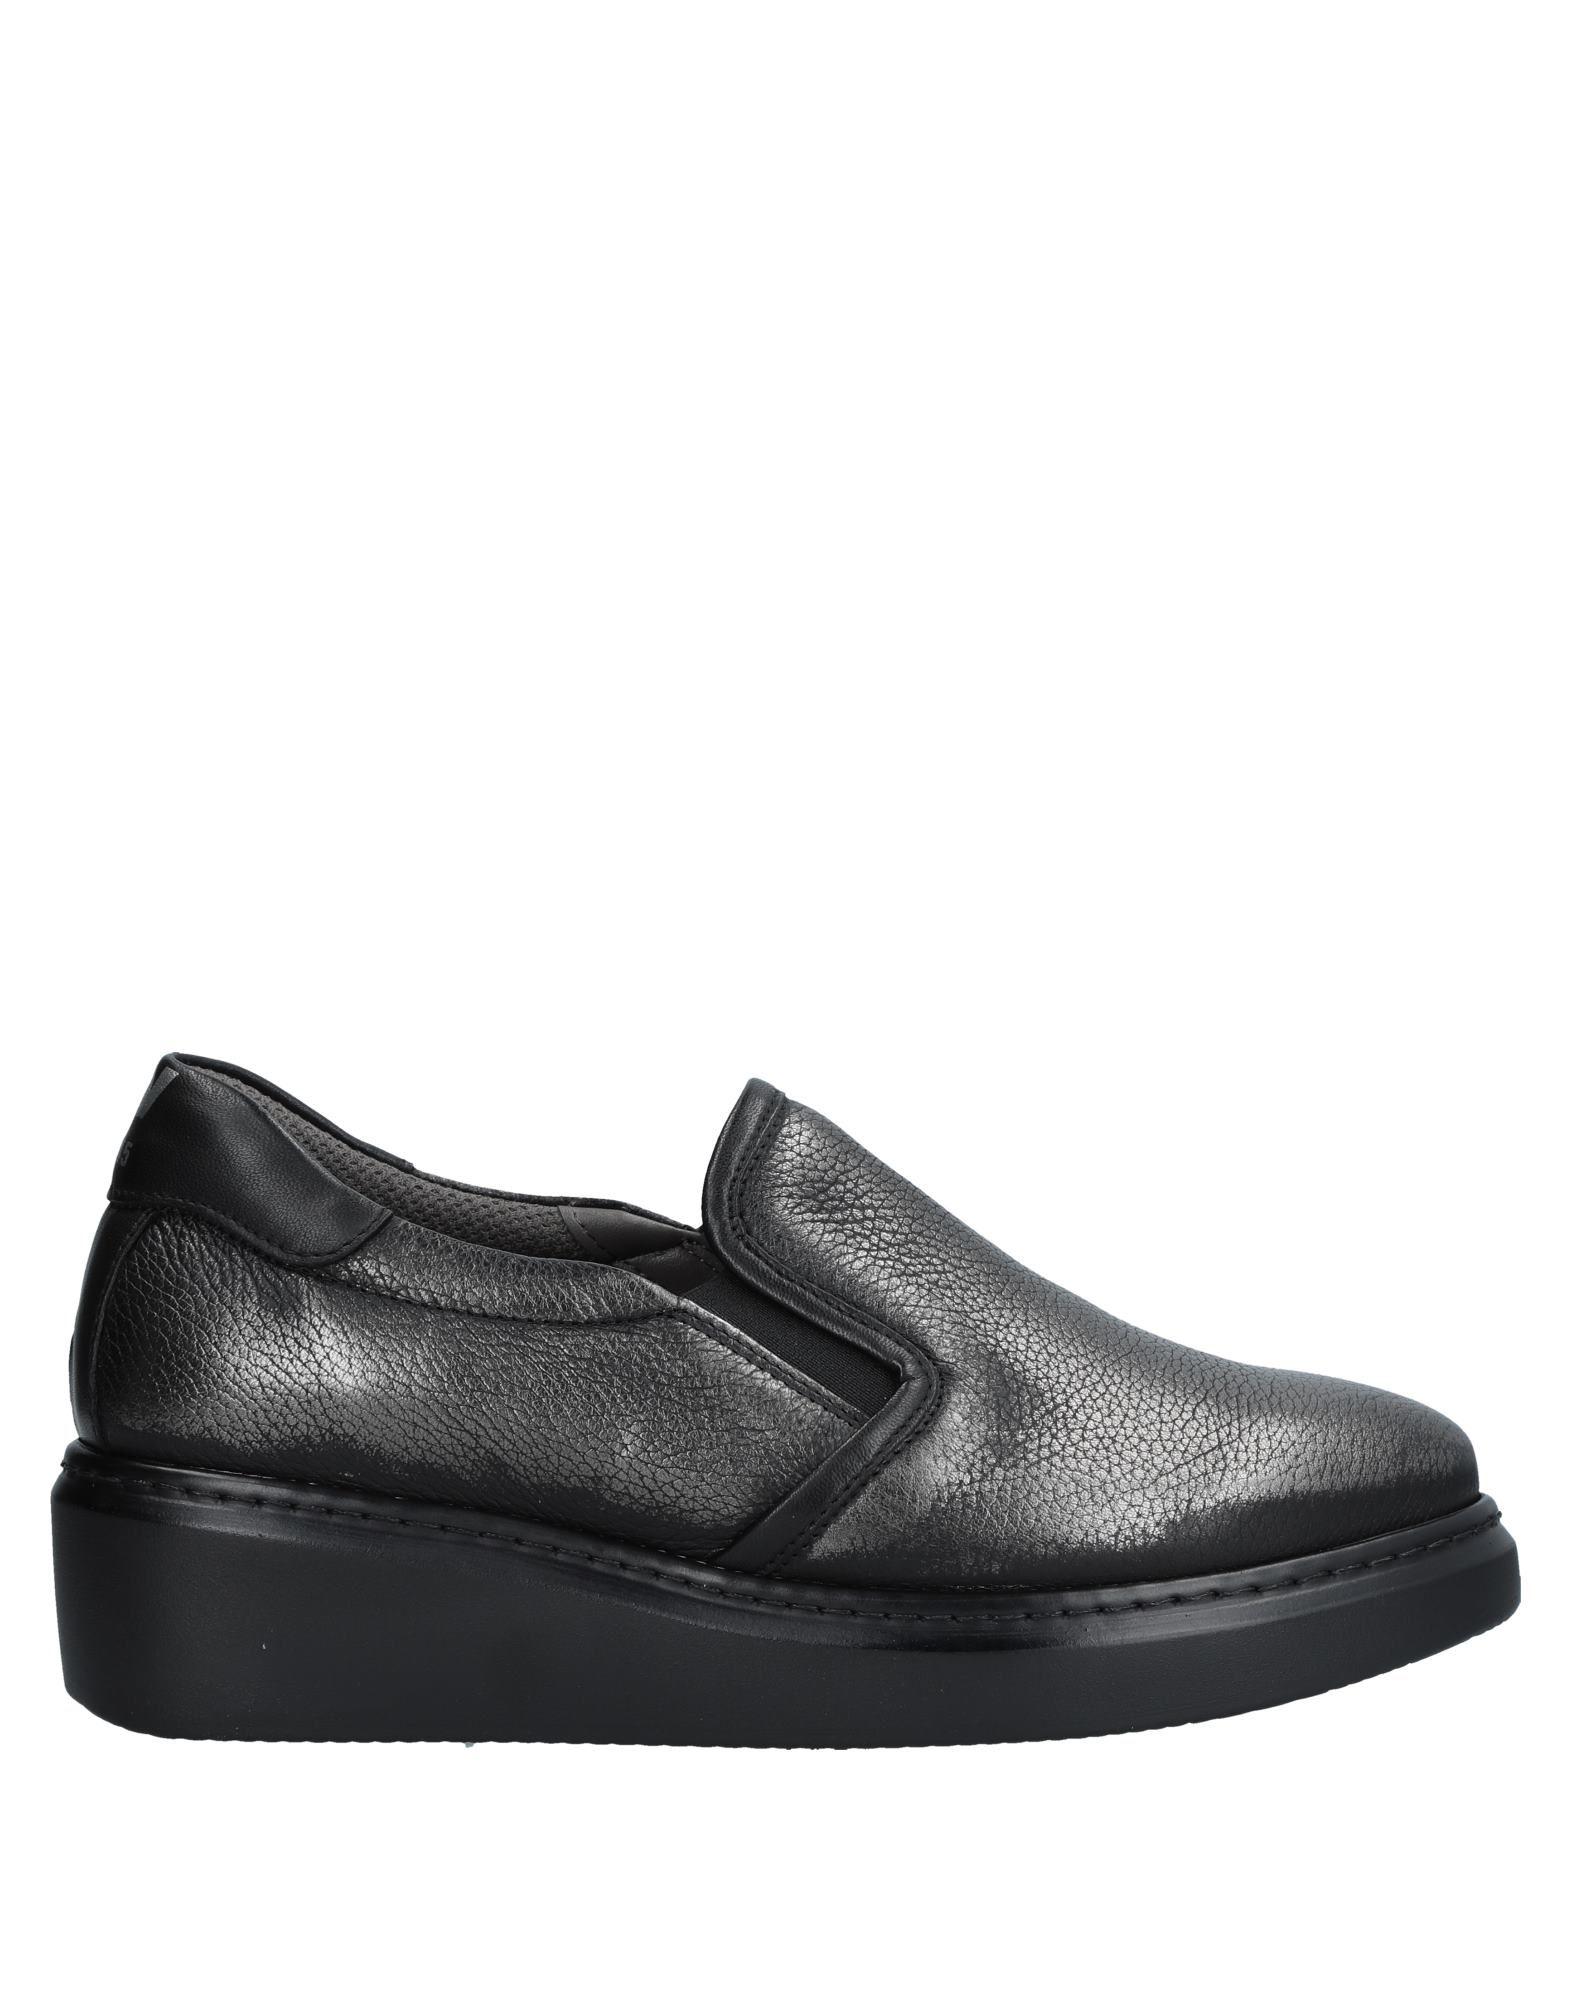 Walk Qualität By Melluso Sneakers Damen  11535087KN Gute Qualität Walk beliebte Schuhe 2484dc